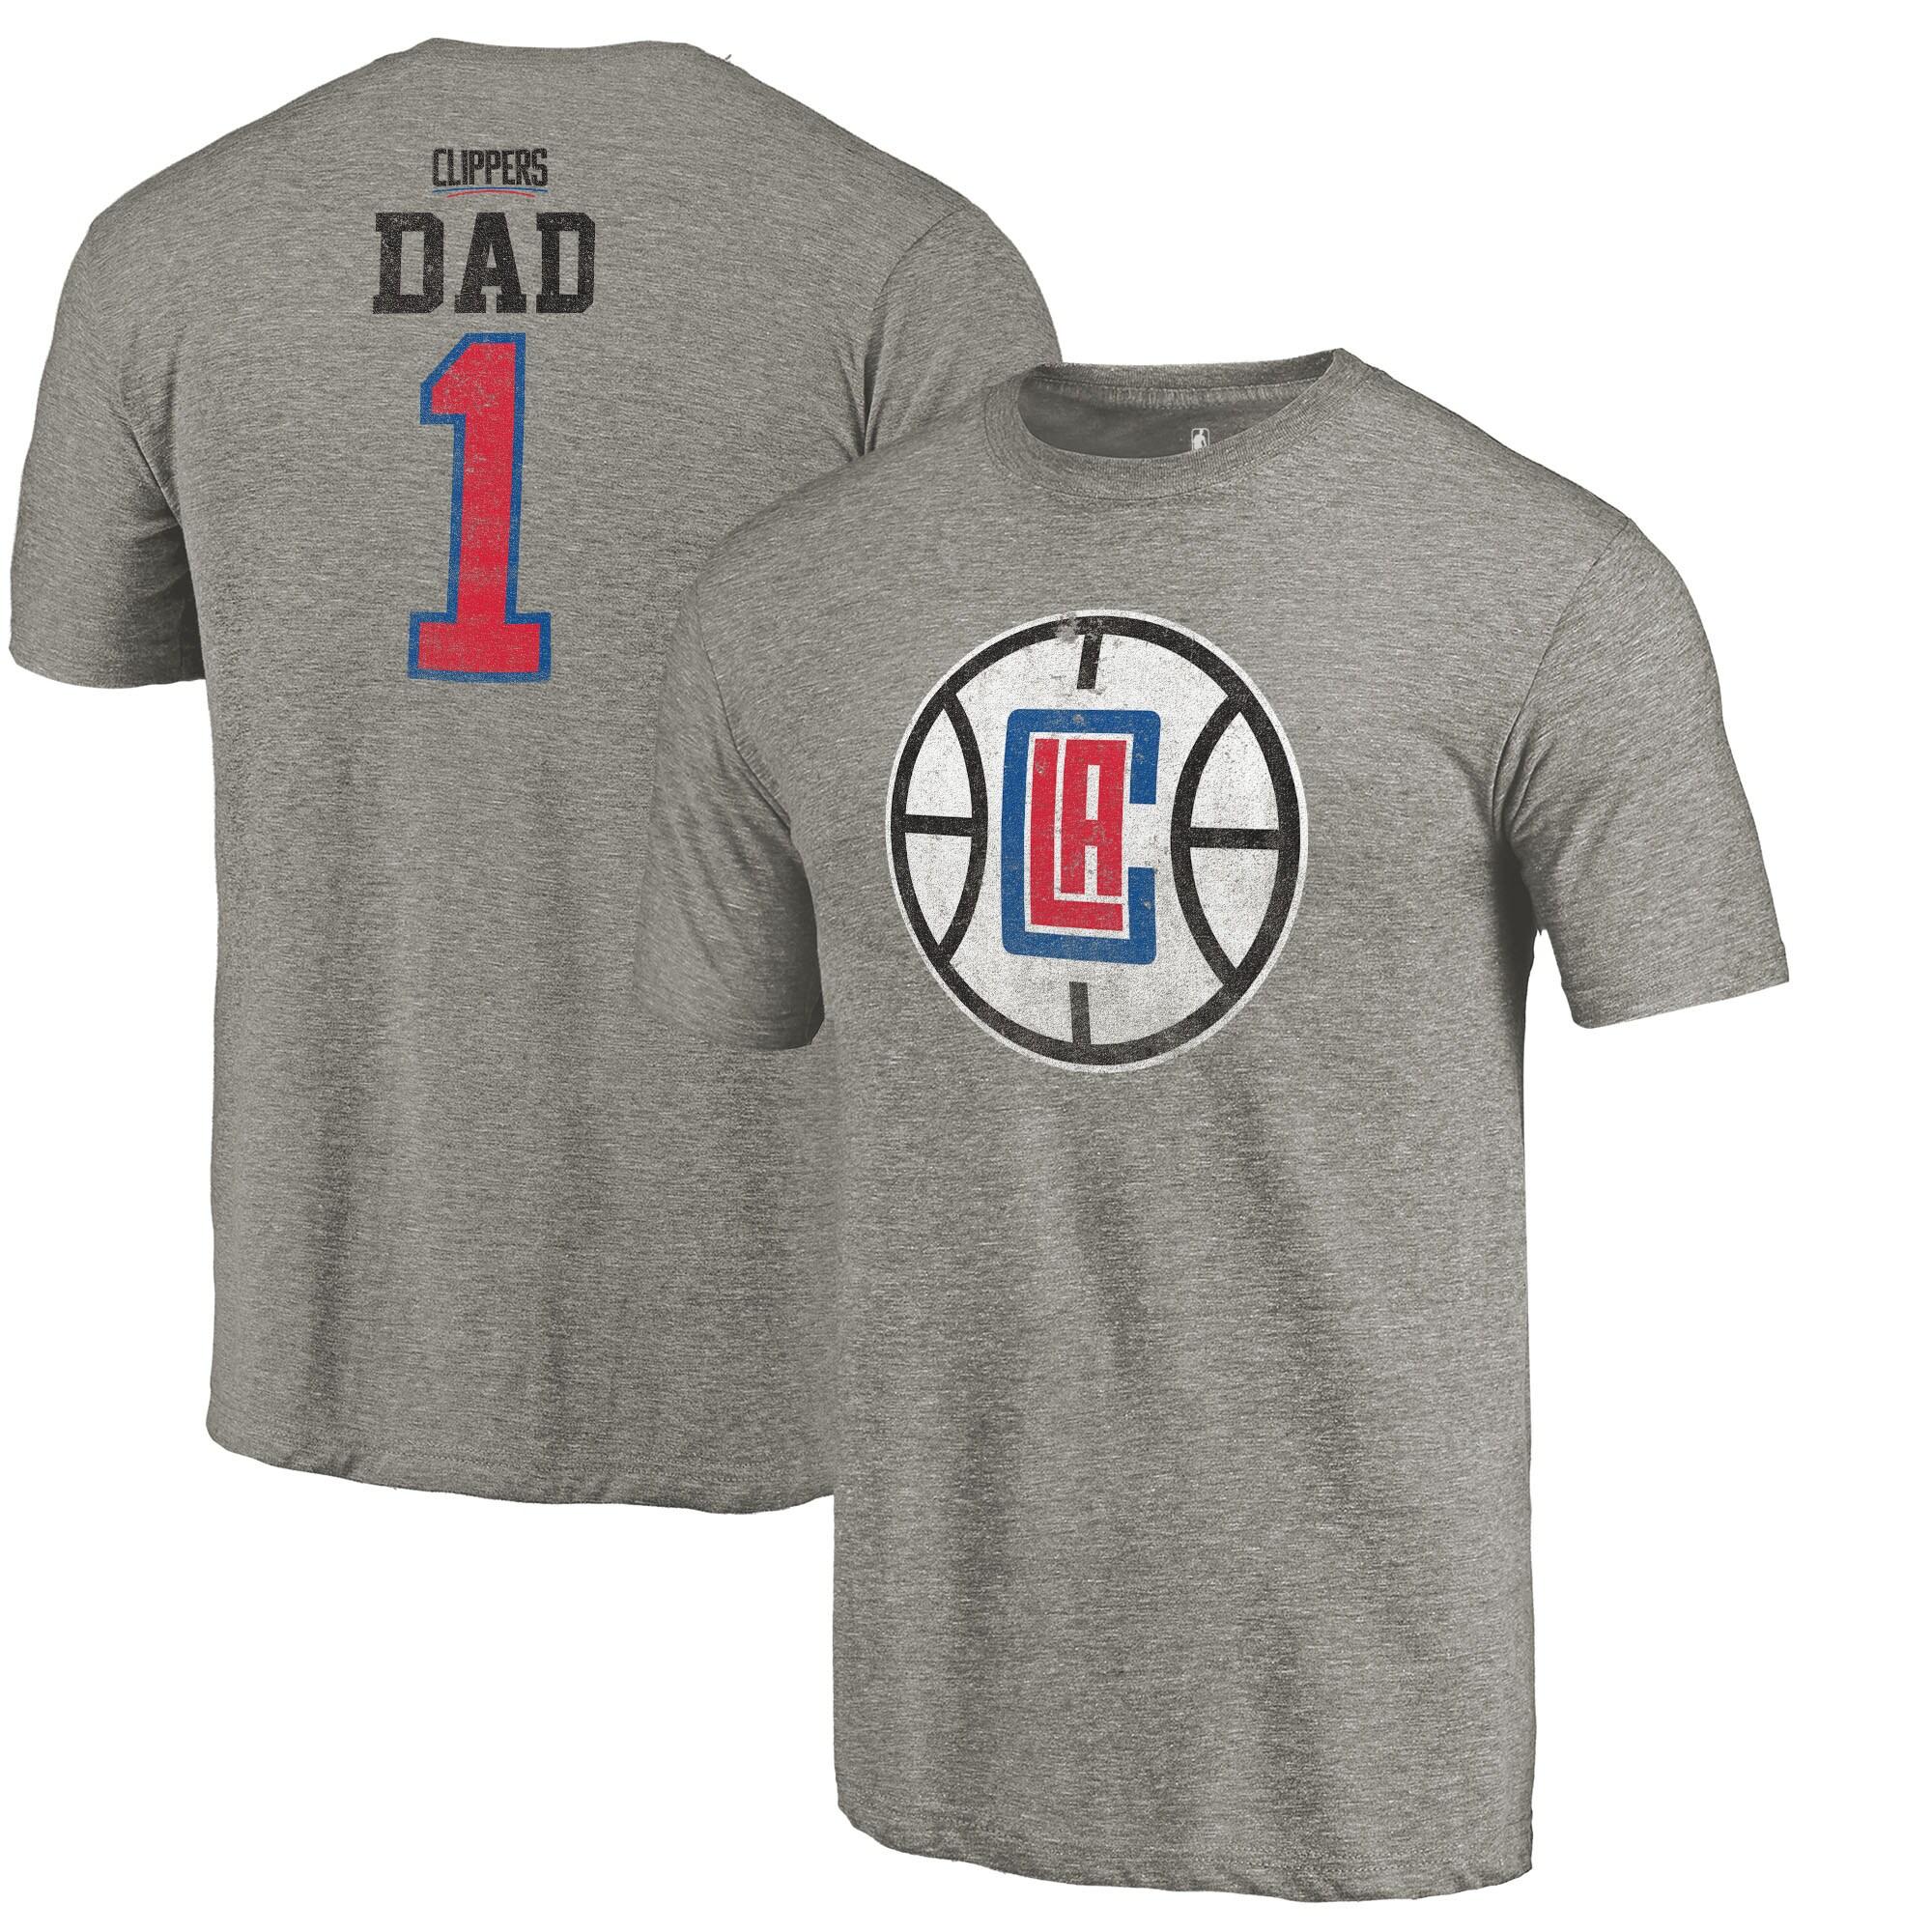 LA Clippers Fanatics Branded Greatest Dad Tri-Blend T-Shirt - Gray